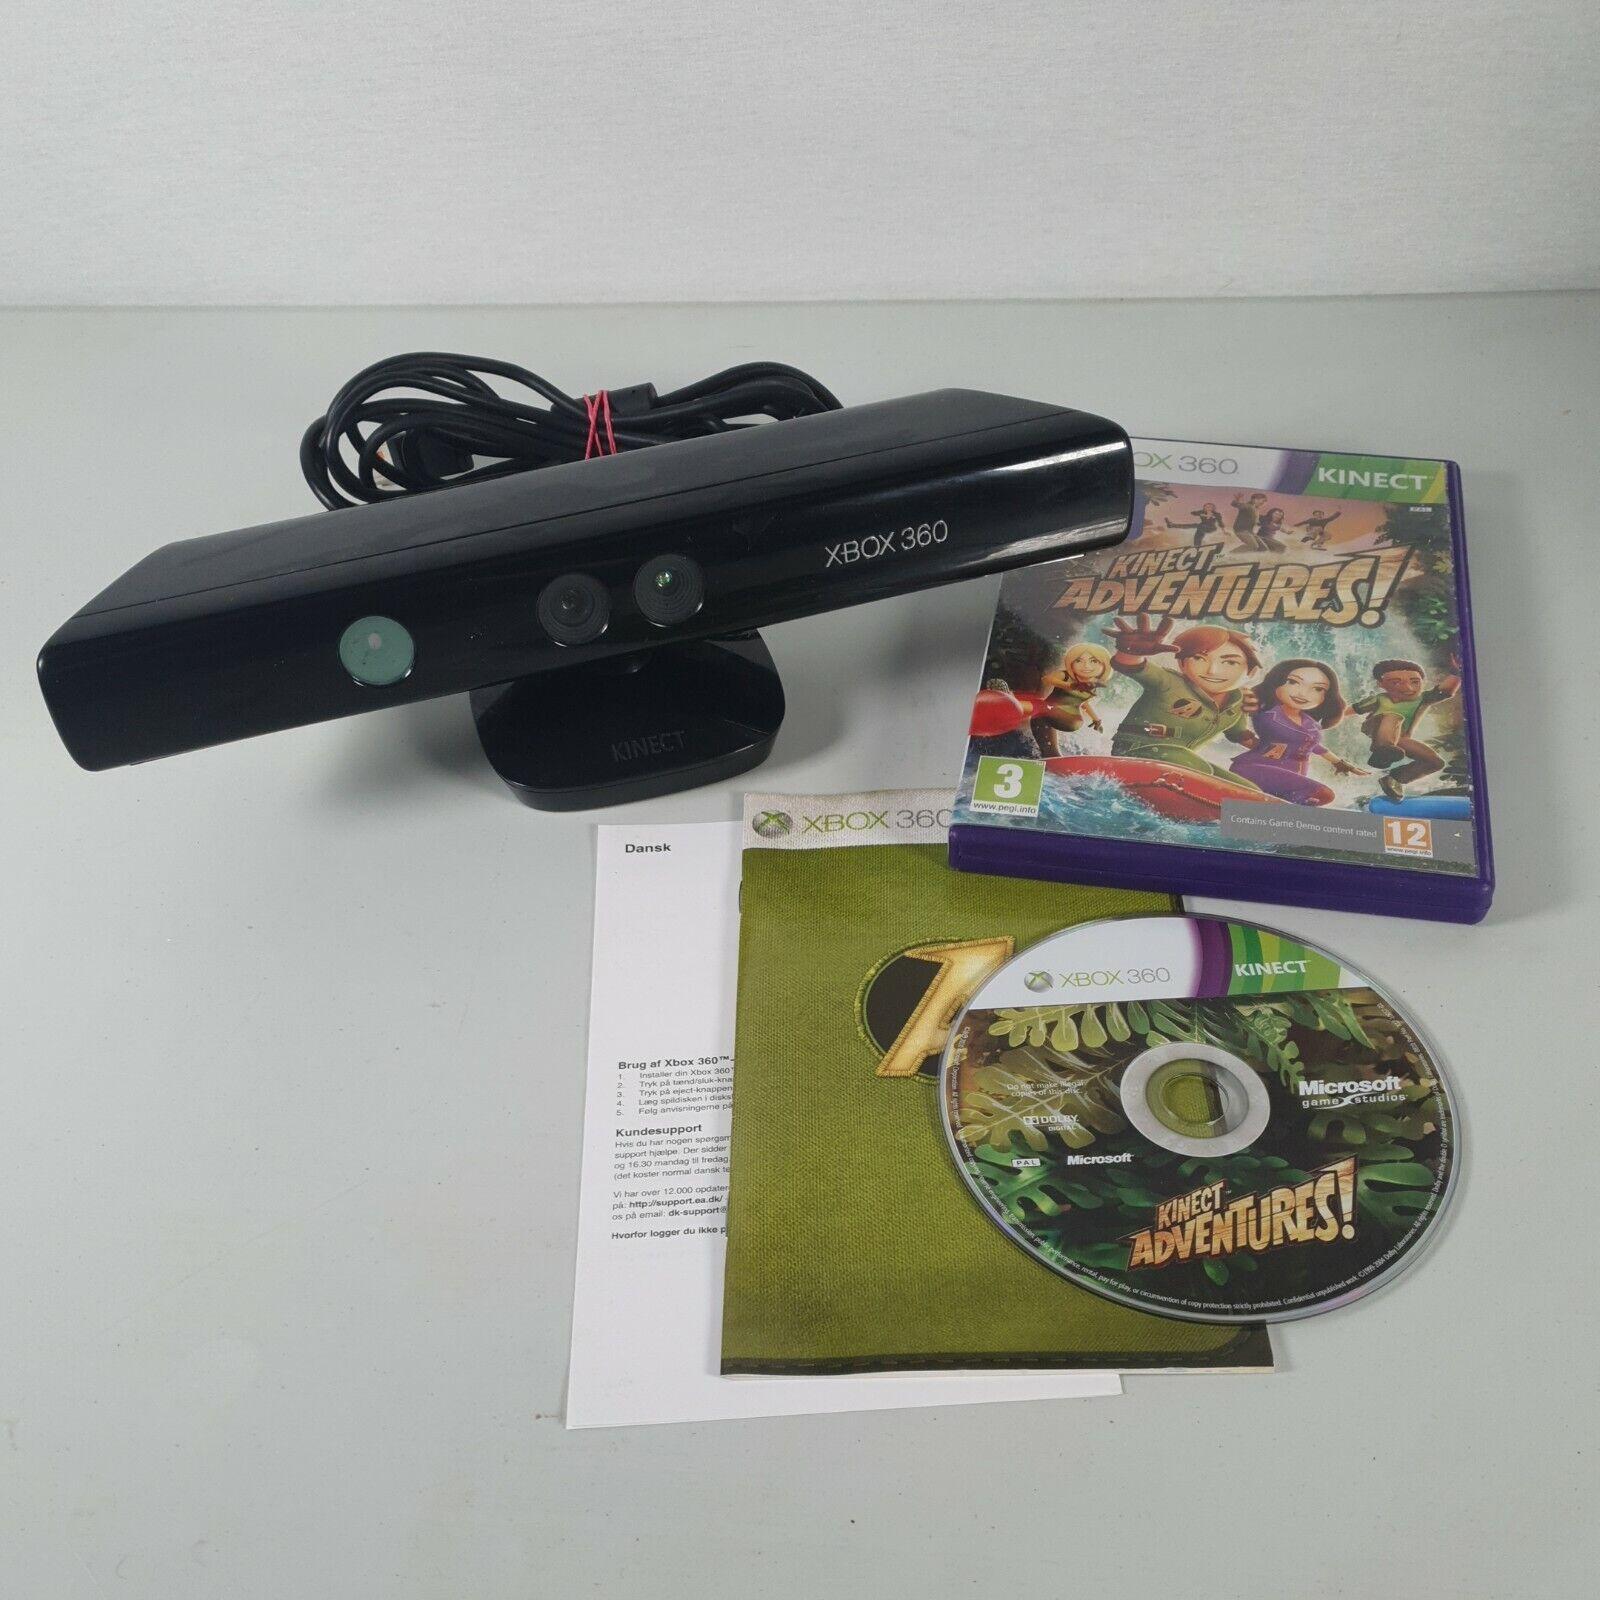 Xbox 360 Kinect Sensor Bar + Kinect Adventures Game | Model 1414 Tested Working